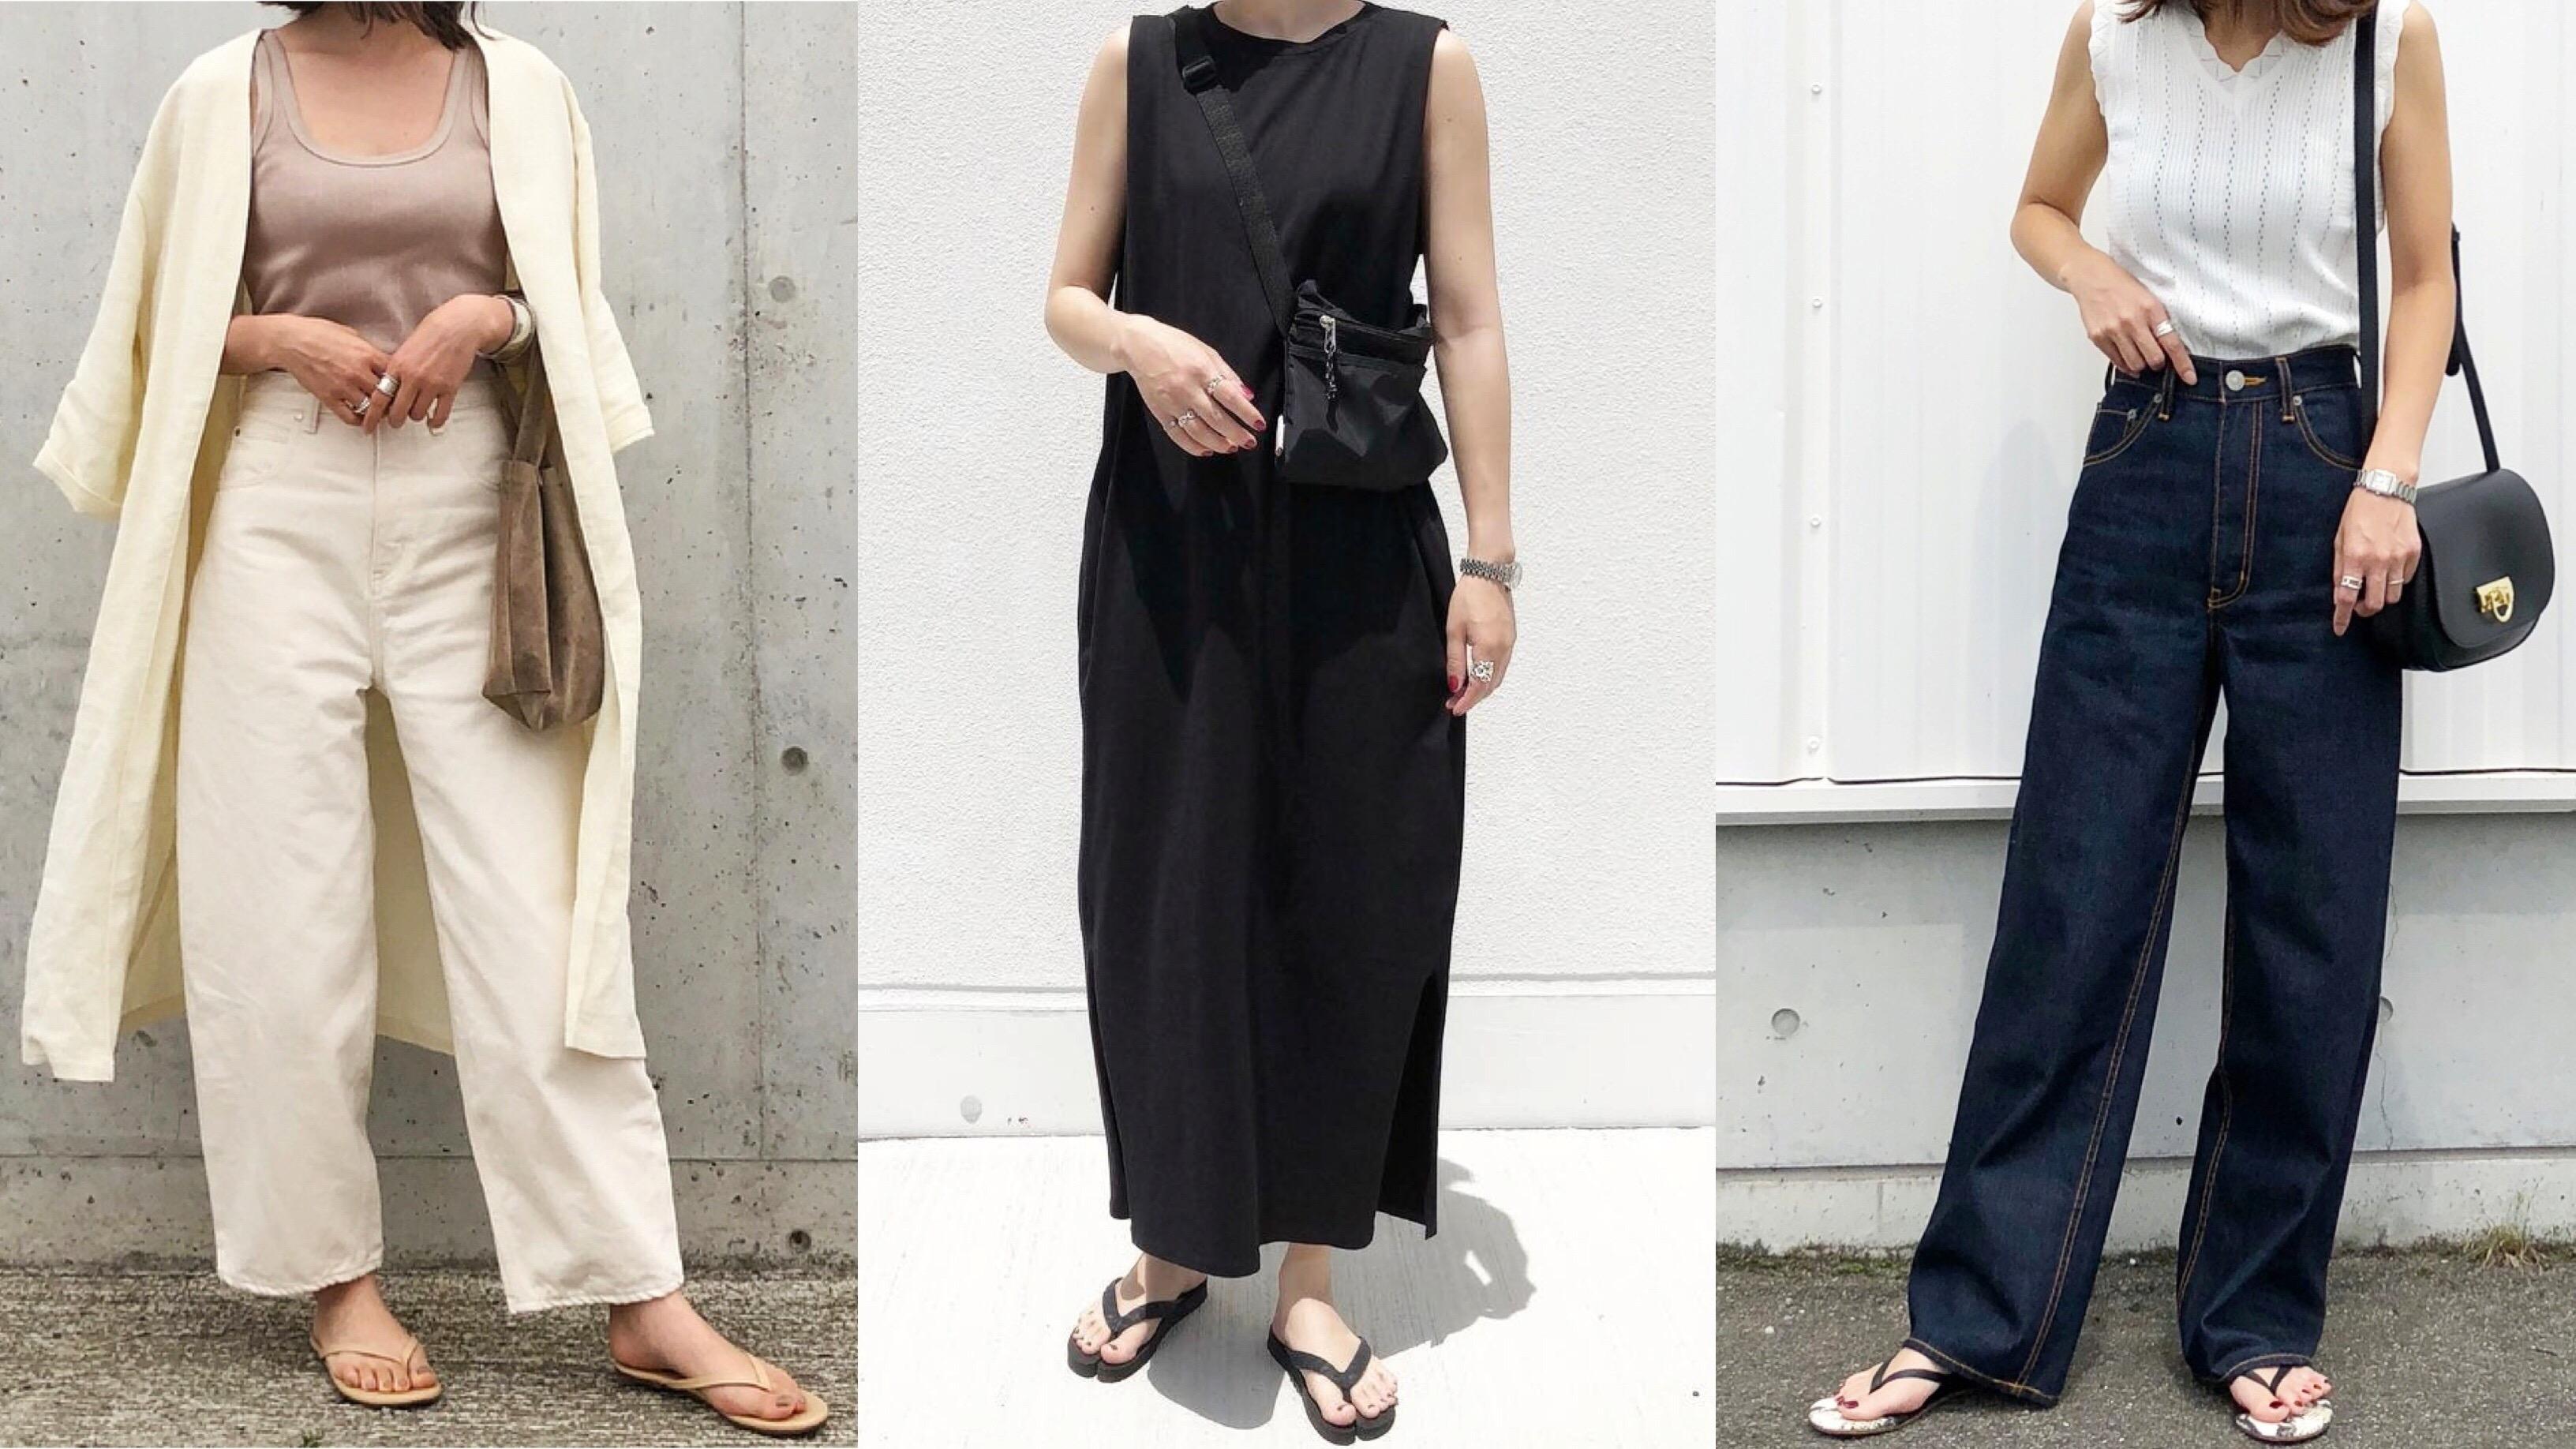 【MINESスナップ】旬のビーチサンダル、今履きたいデザインはこの3つ!